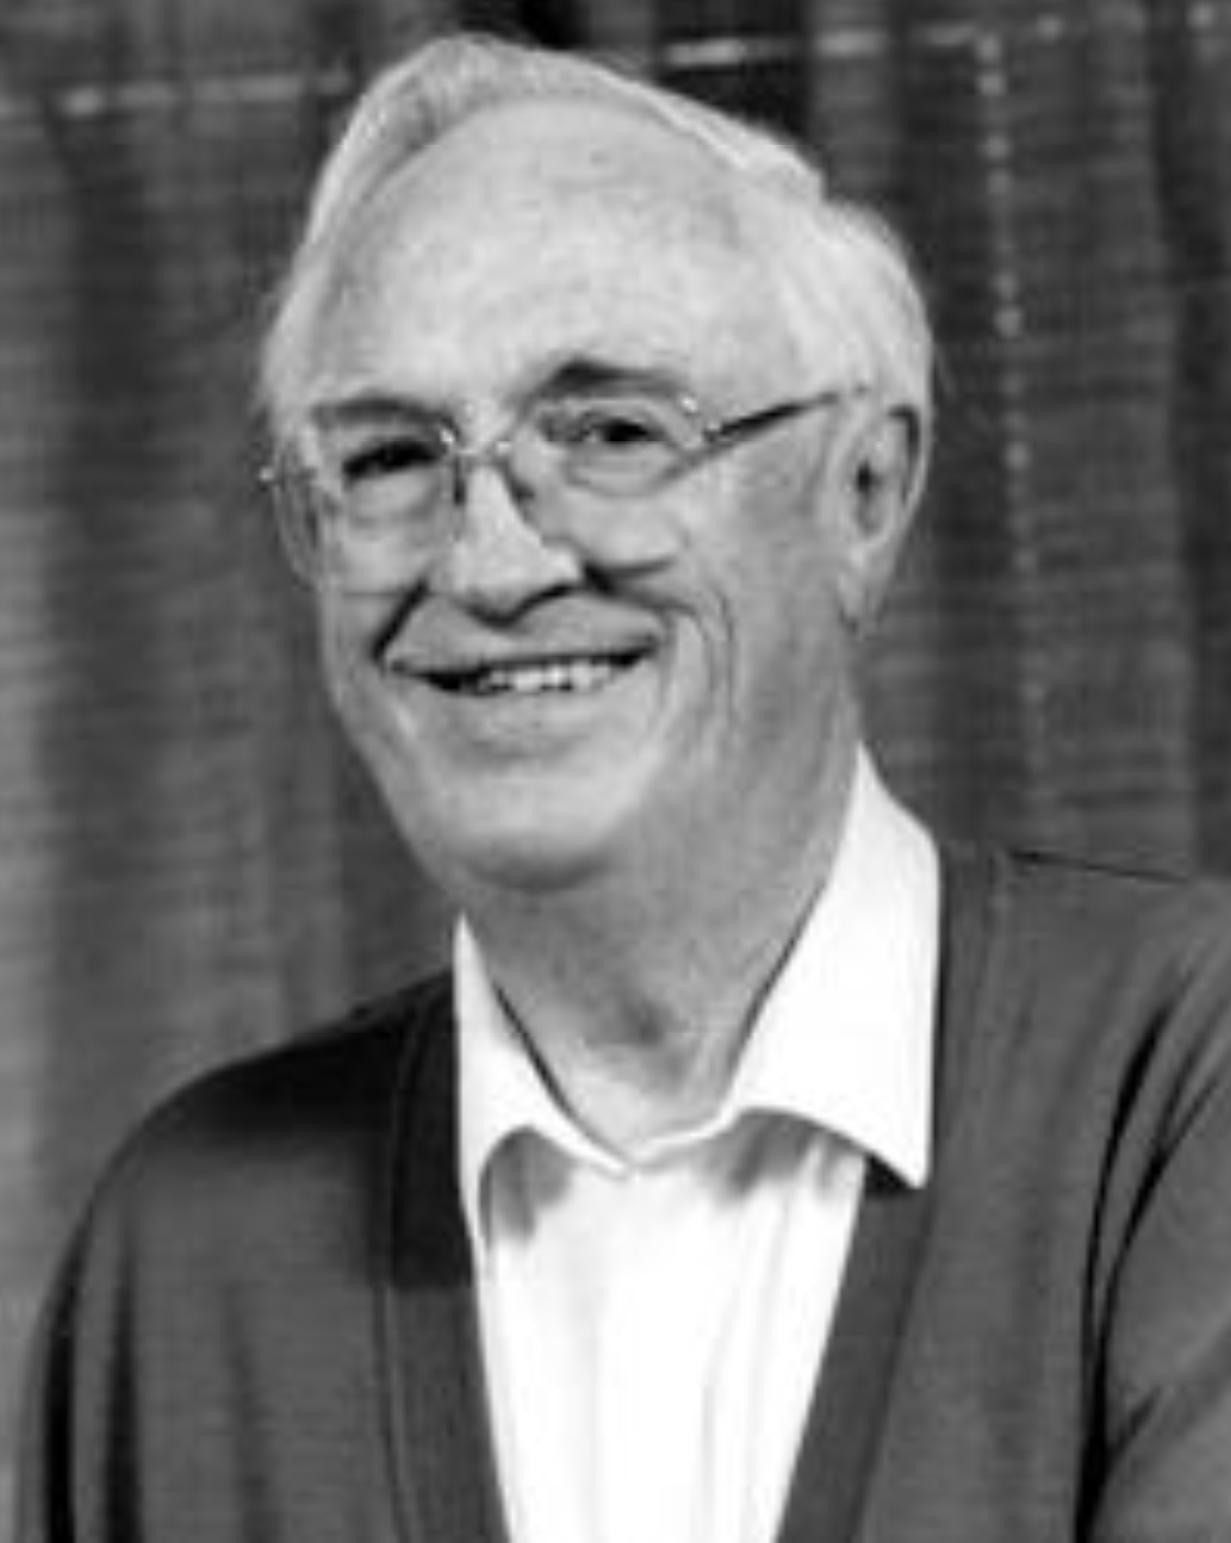 J. FRED HAMBRIGHT